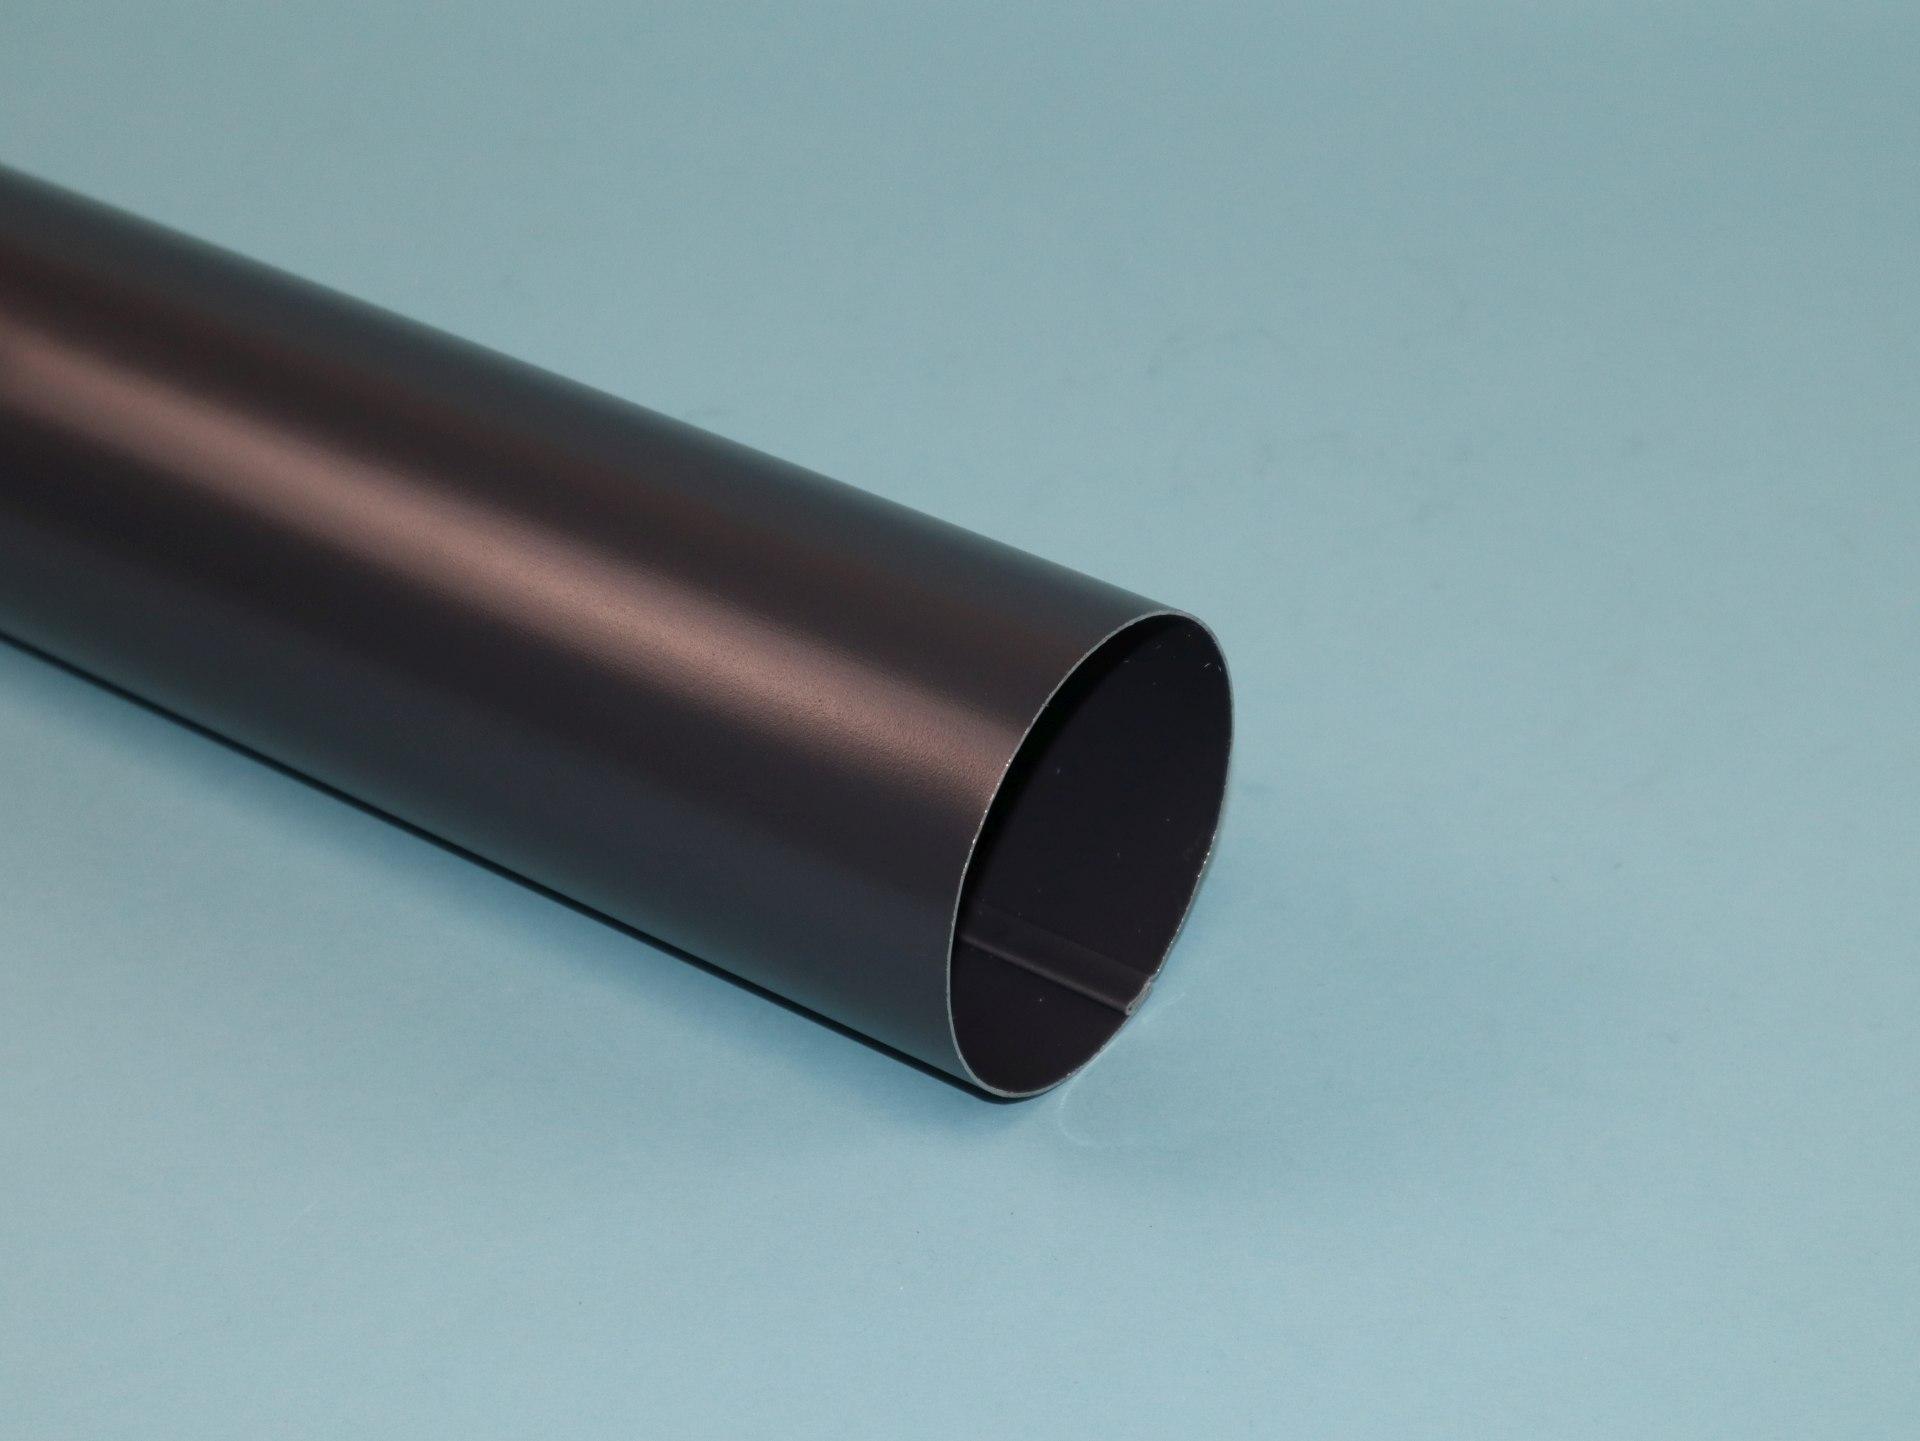 Fallrohr Aluminium anthrazit mit einseitiger Muffe, Länge auswählbar